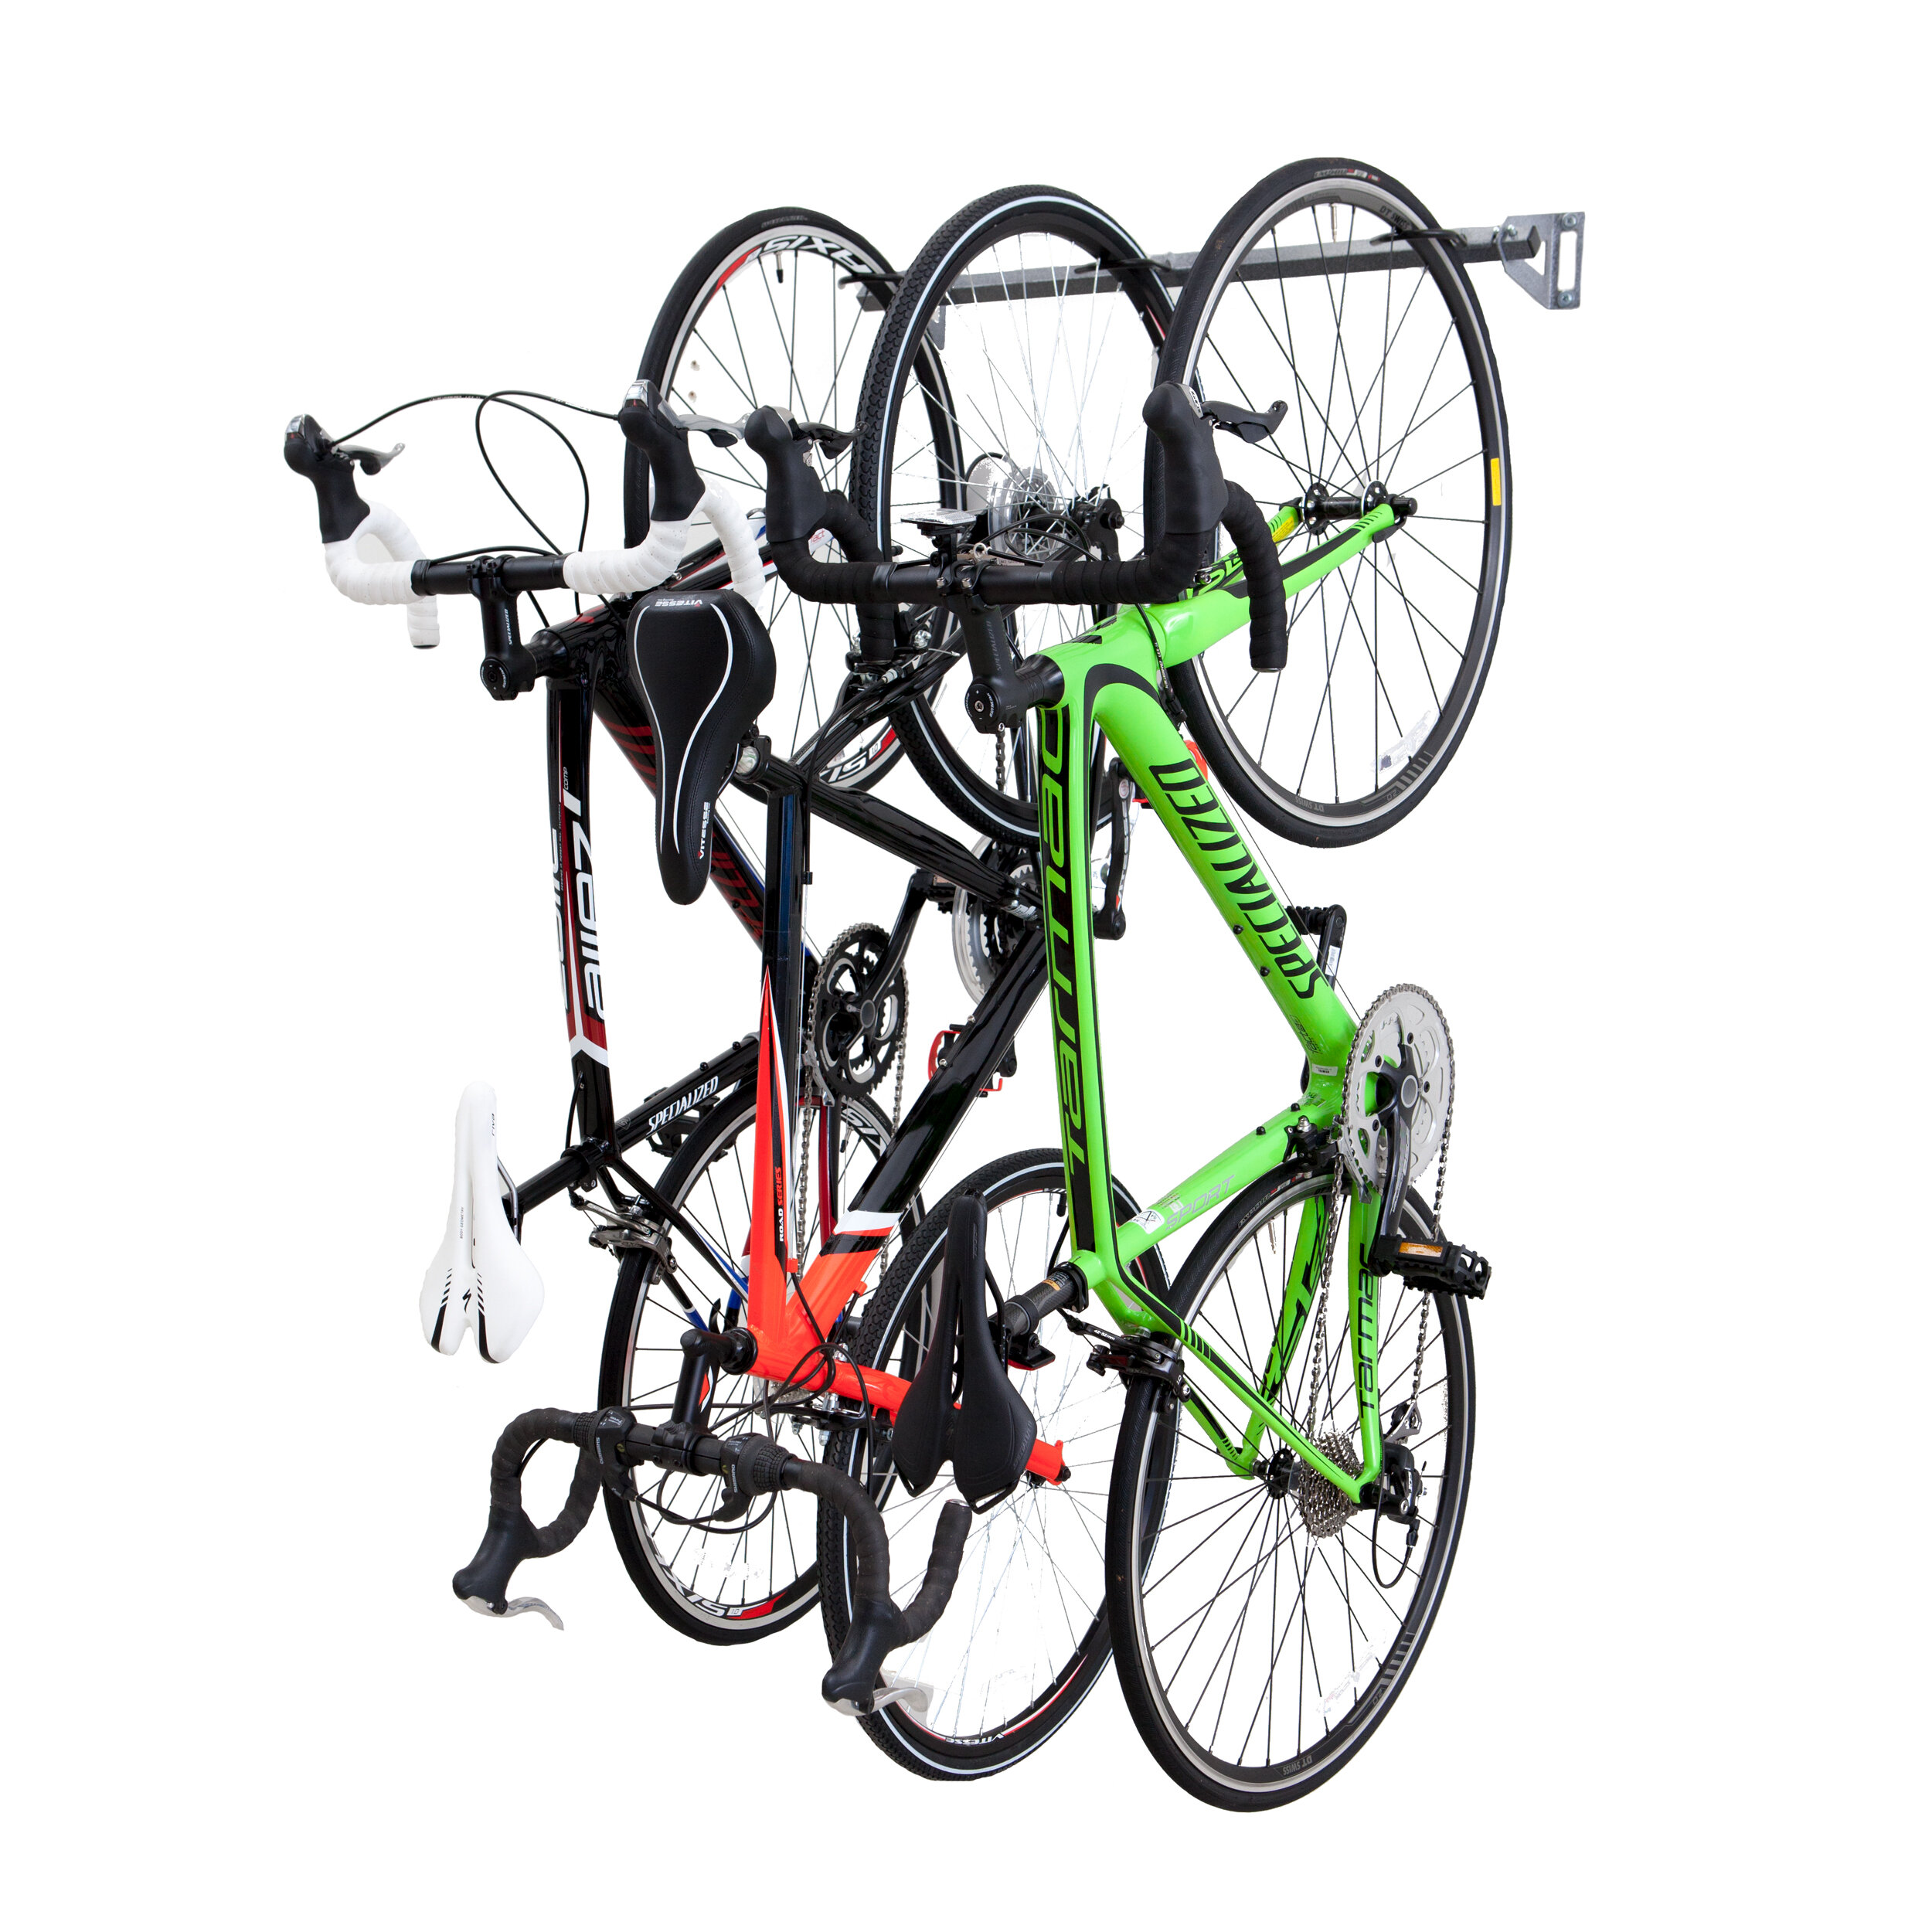 mounted rack racks printableboutique bike creative simple wall